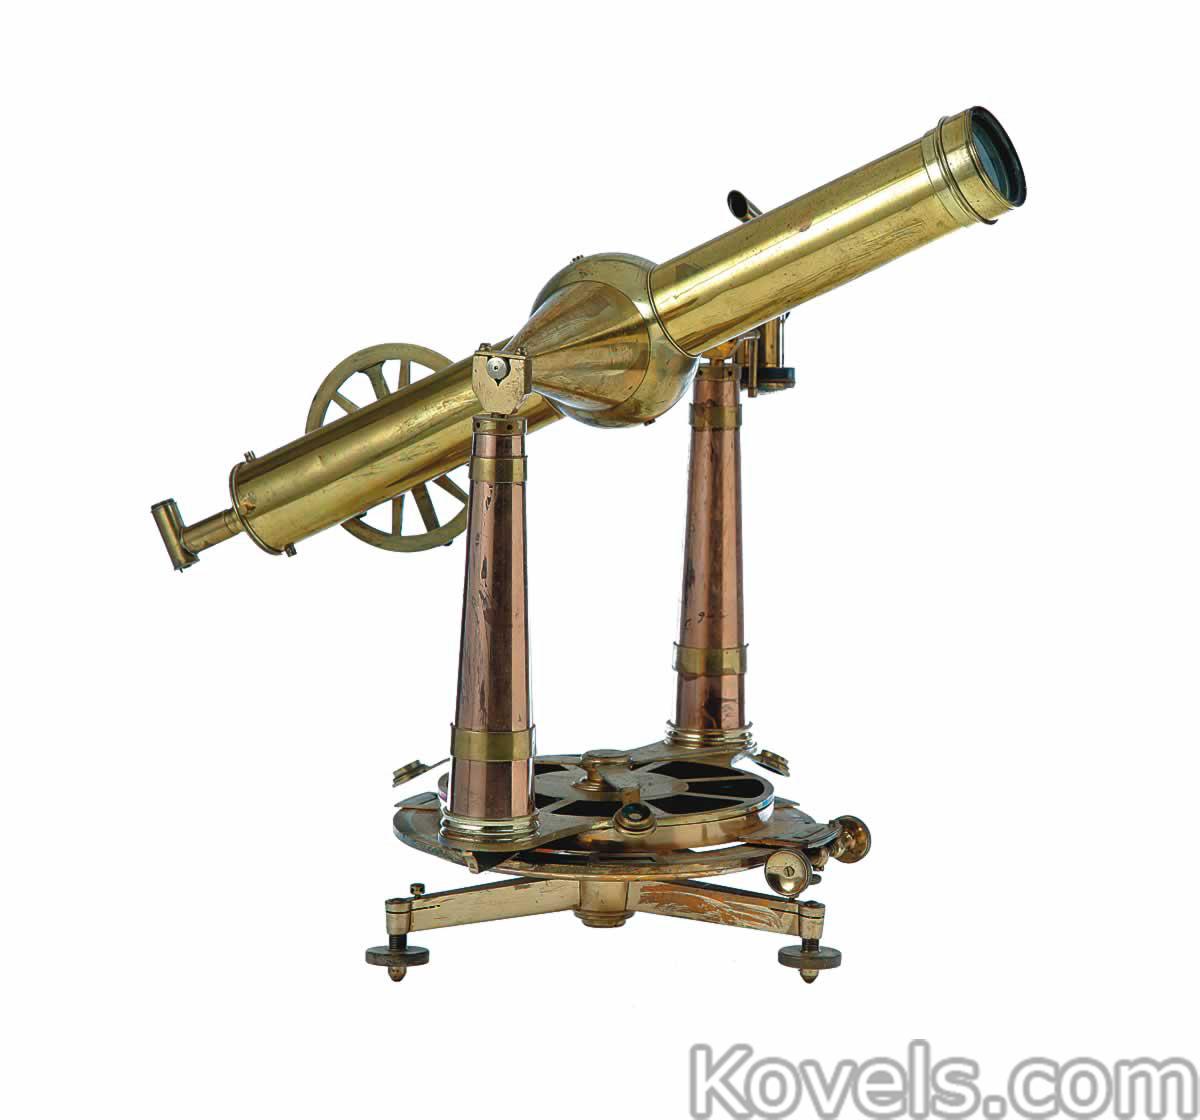 Antique Science Instruments : Antique scientific instruments technology price guide